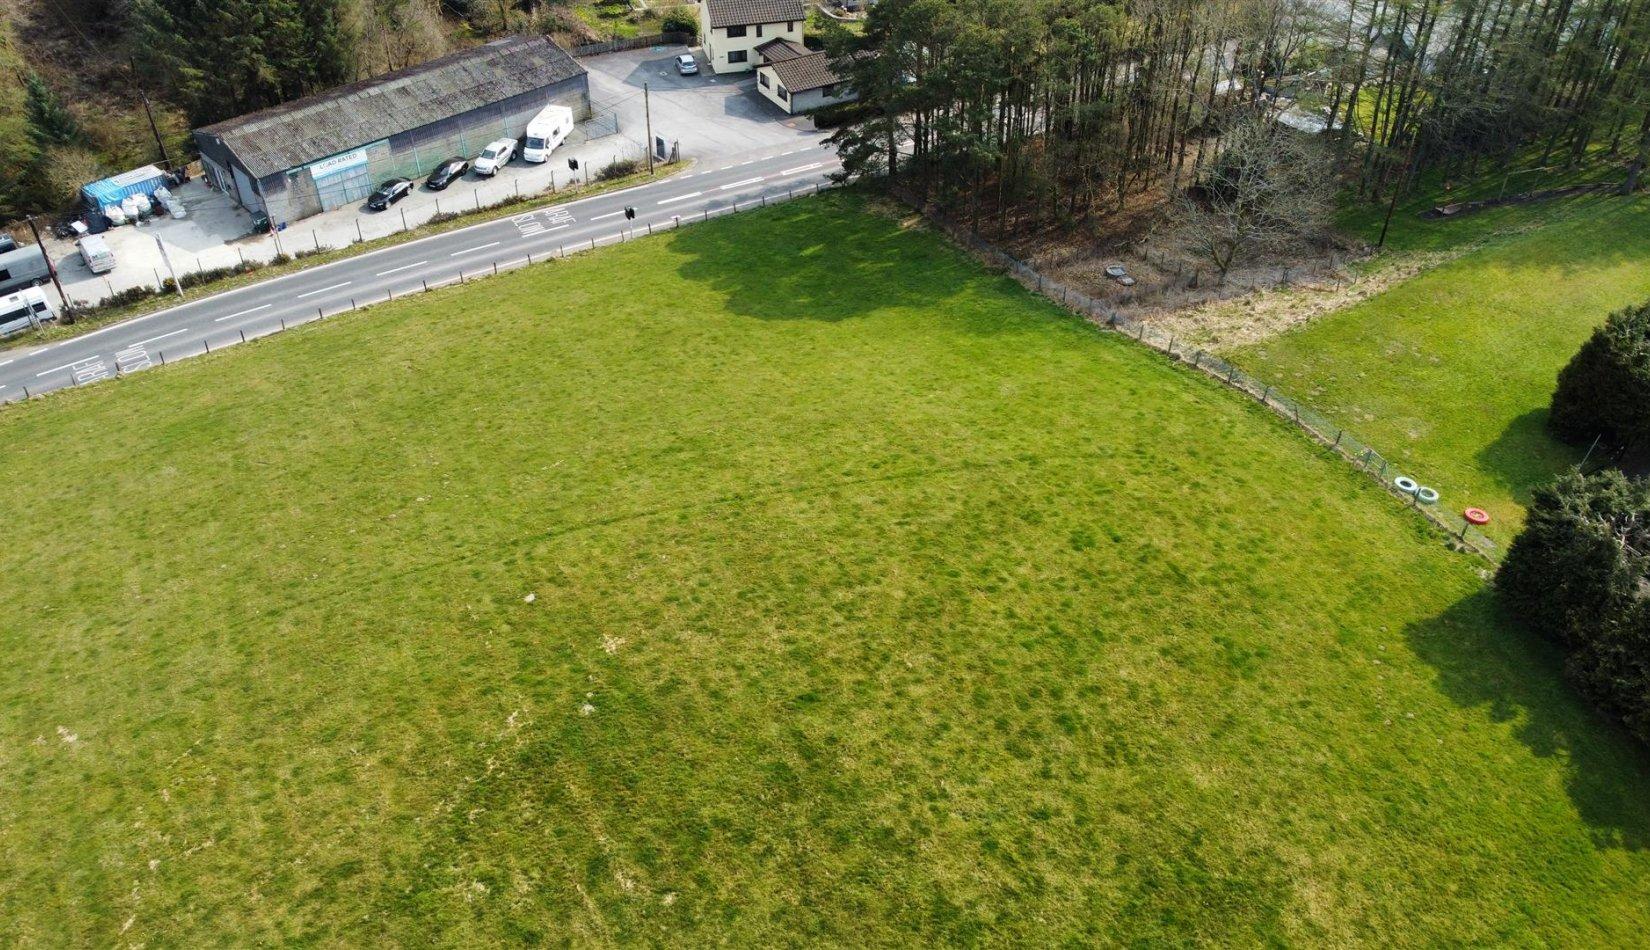 drone photo 3.JPG